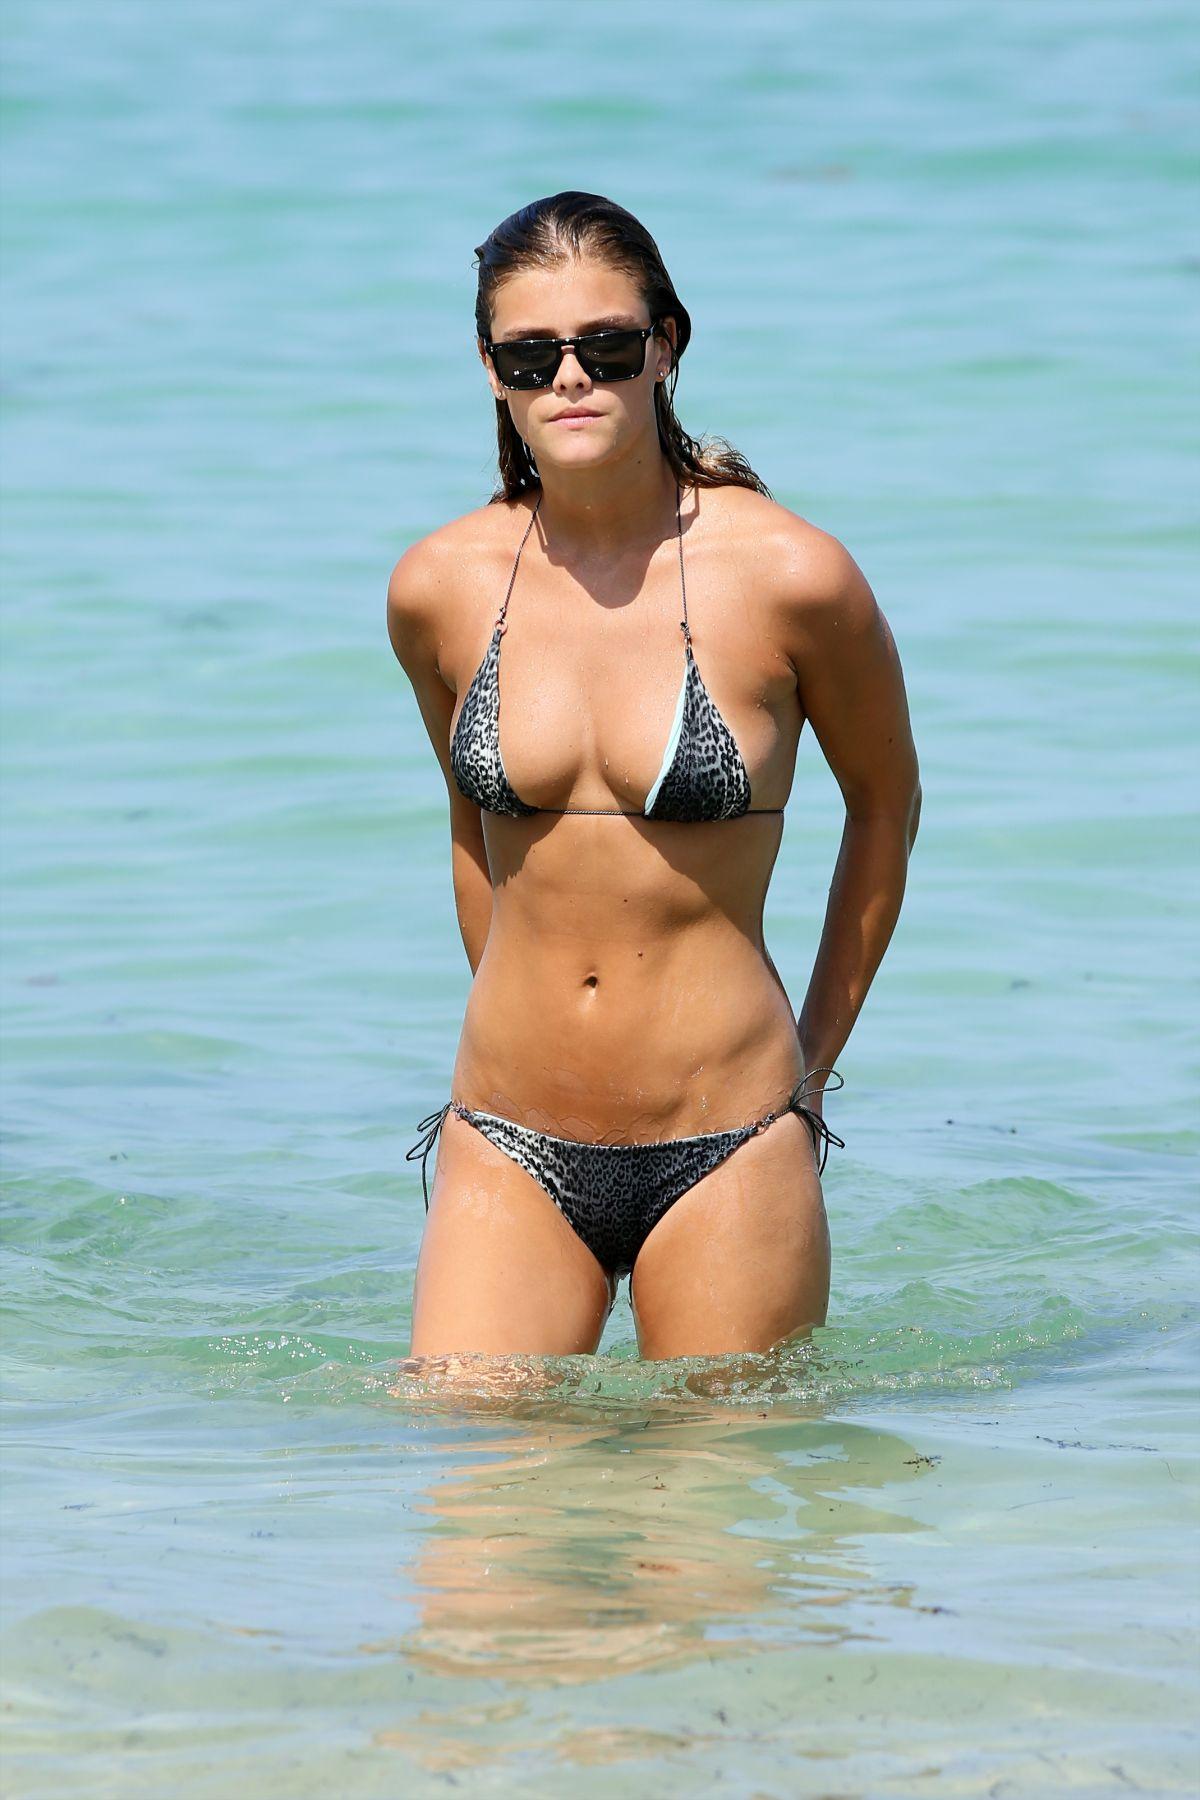 Bikini Briana Evigan nudes (93 foto and video), Tits, Leaked, Selfie, underwear 2015